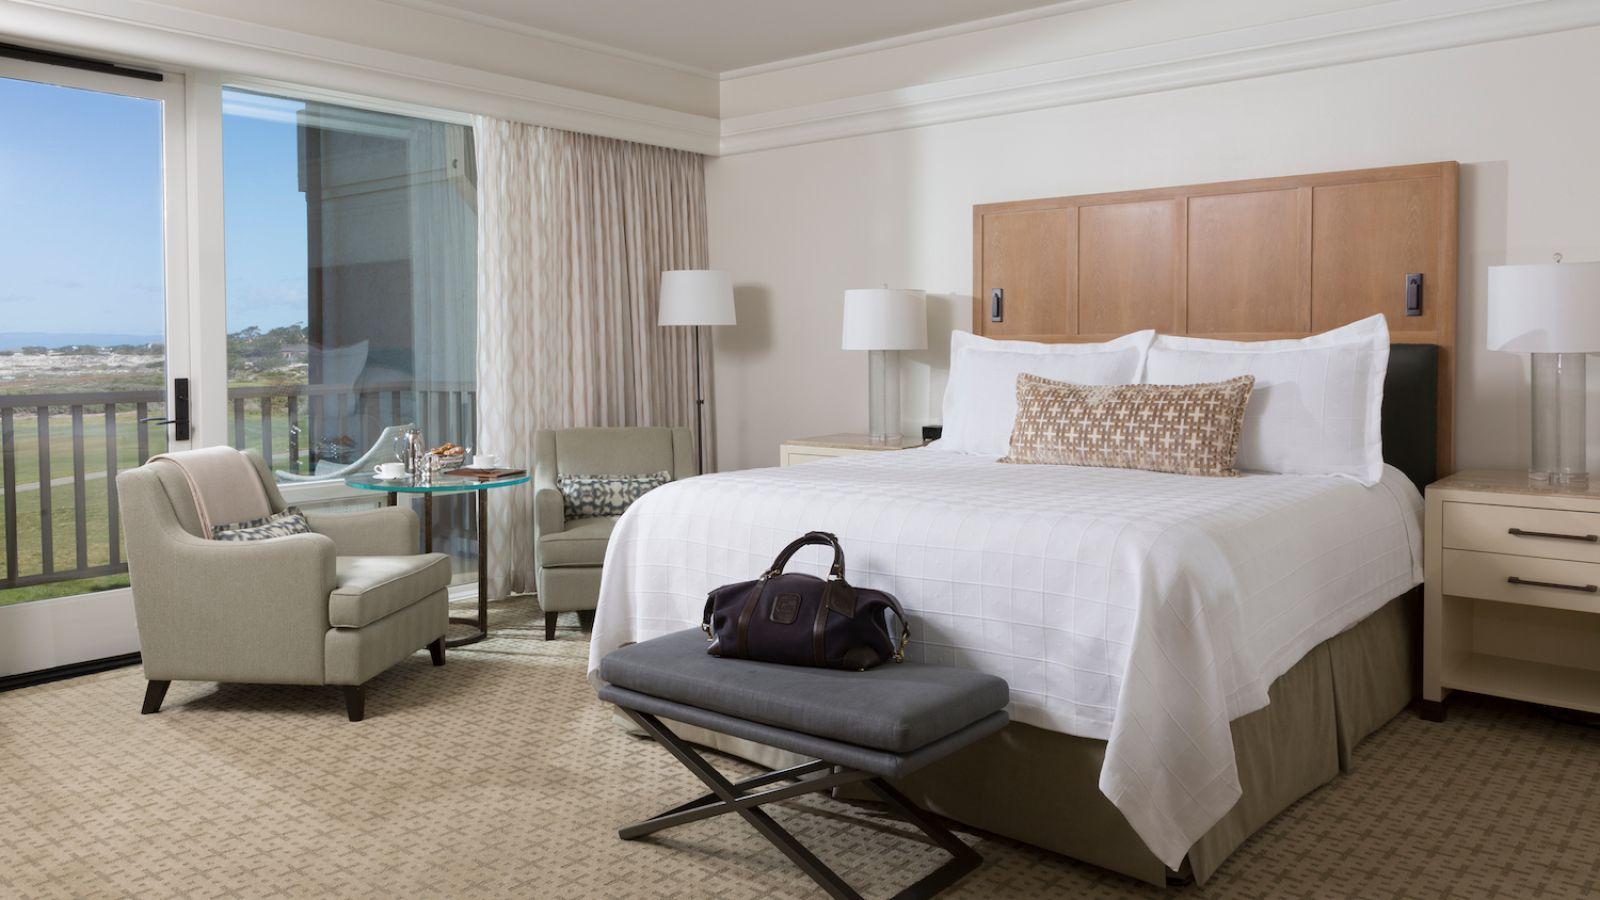 The Inn at Spanish Bay ™Renovated Ocean View Room - Pebble Beach Resorts®  © Noah Webb